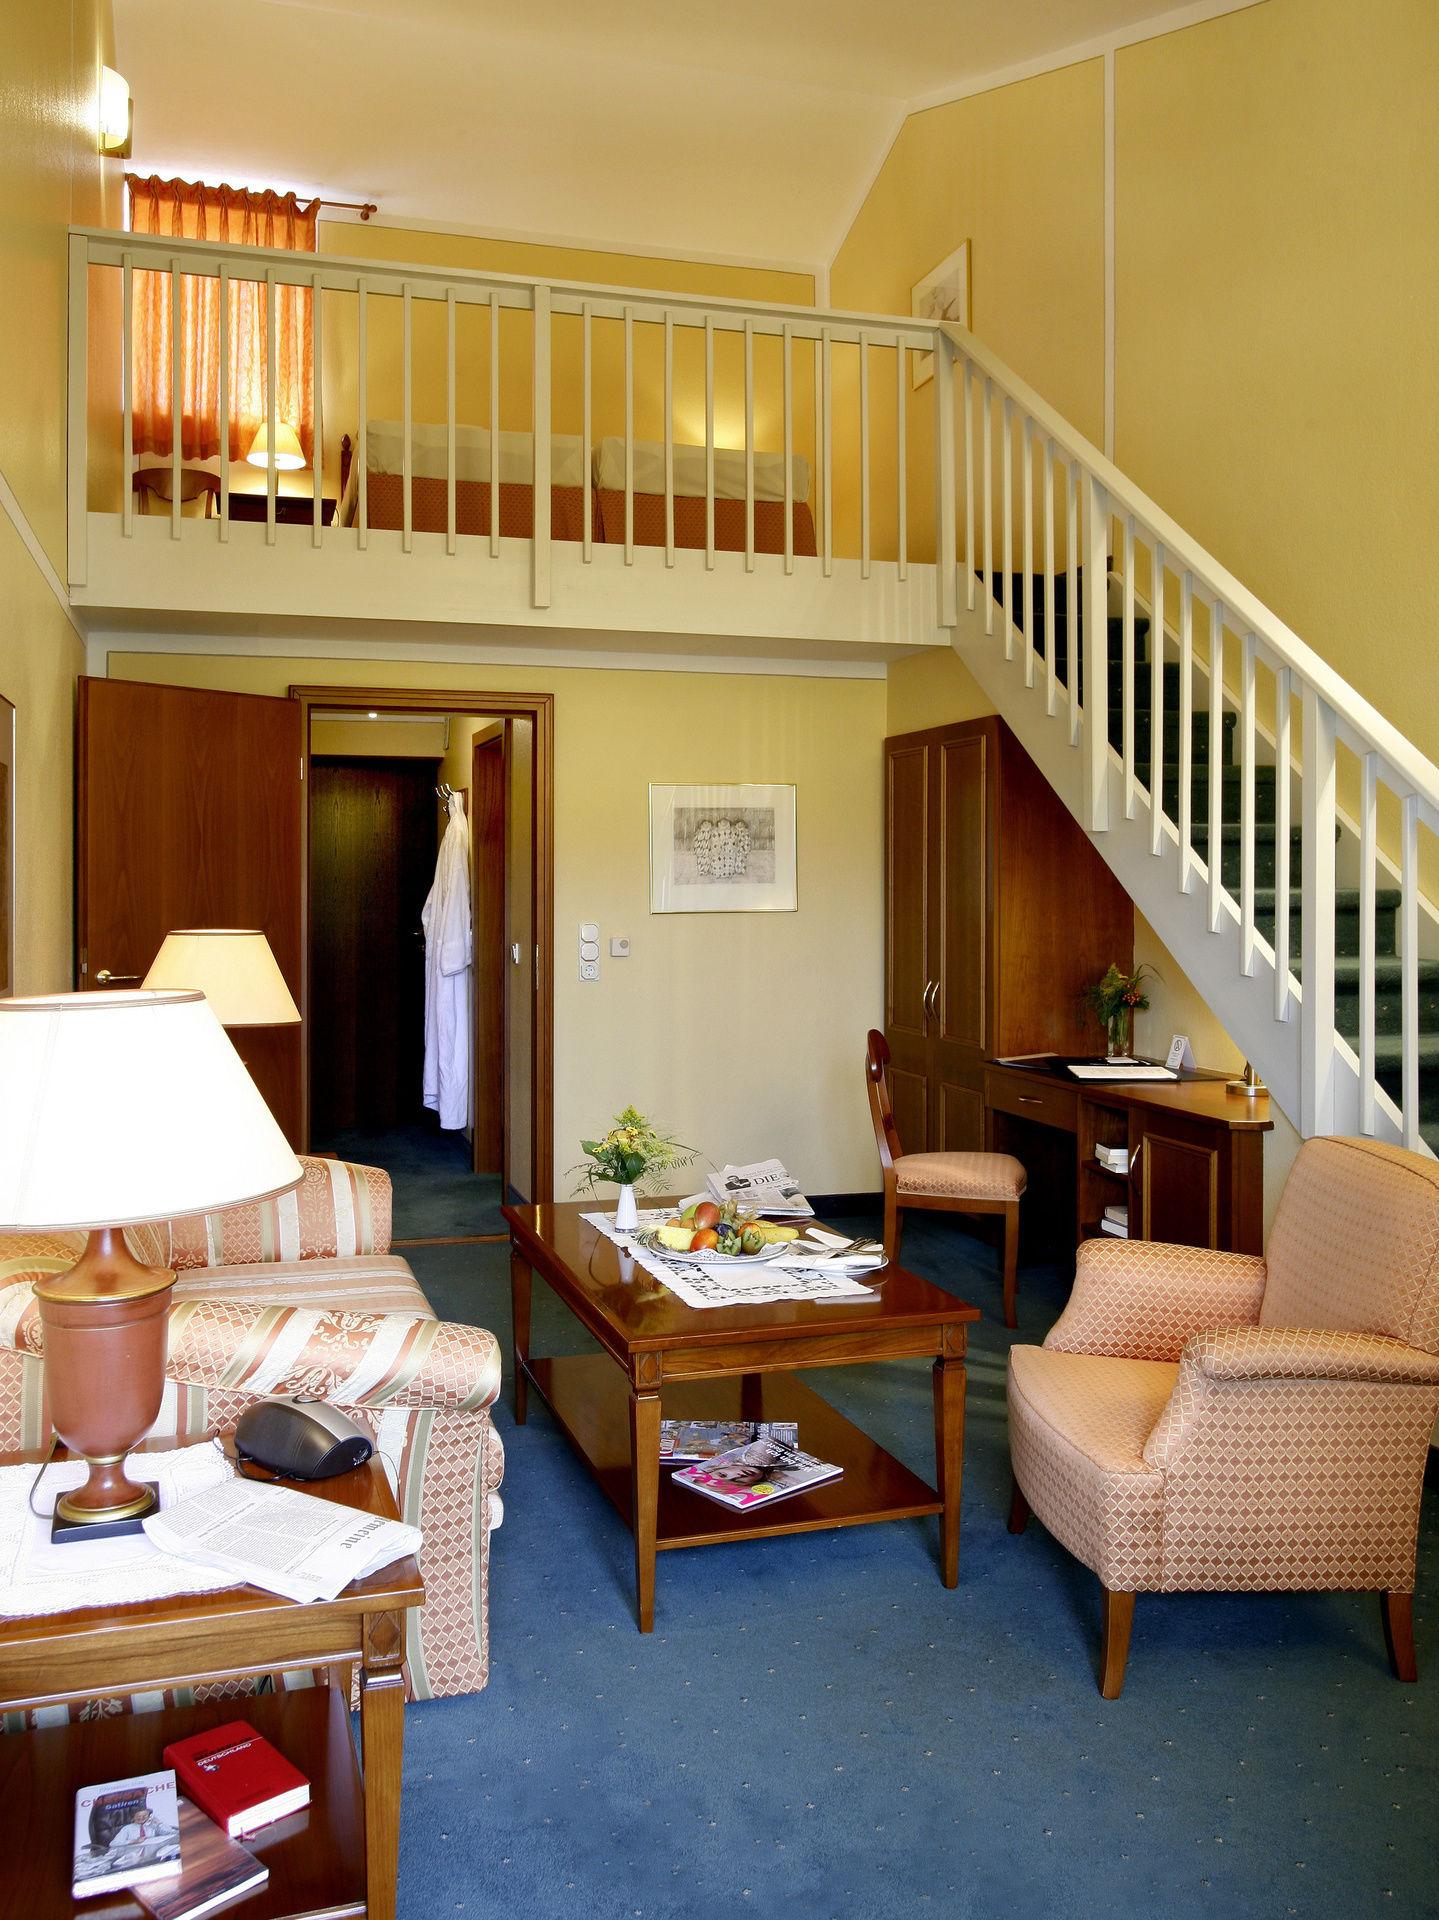 Hotel Bad Birnbach Bademantelgang